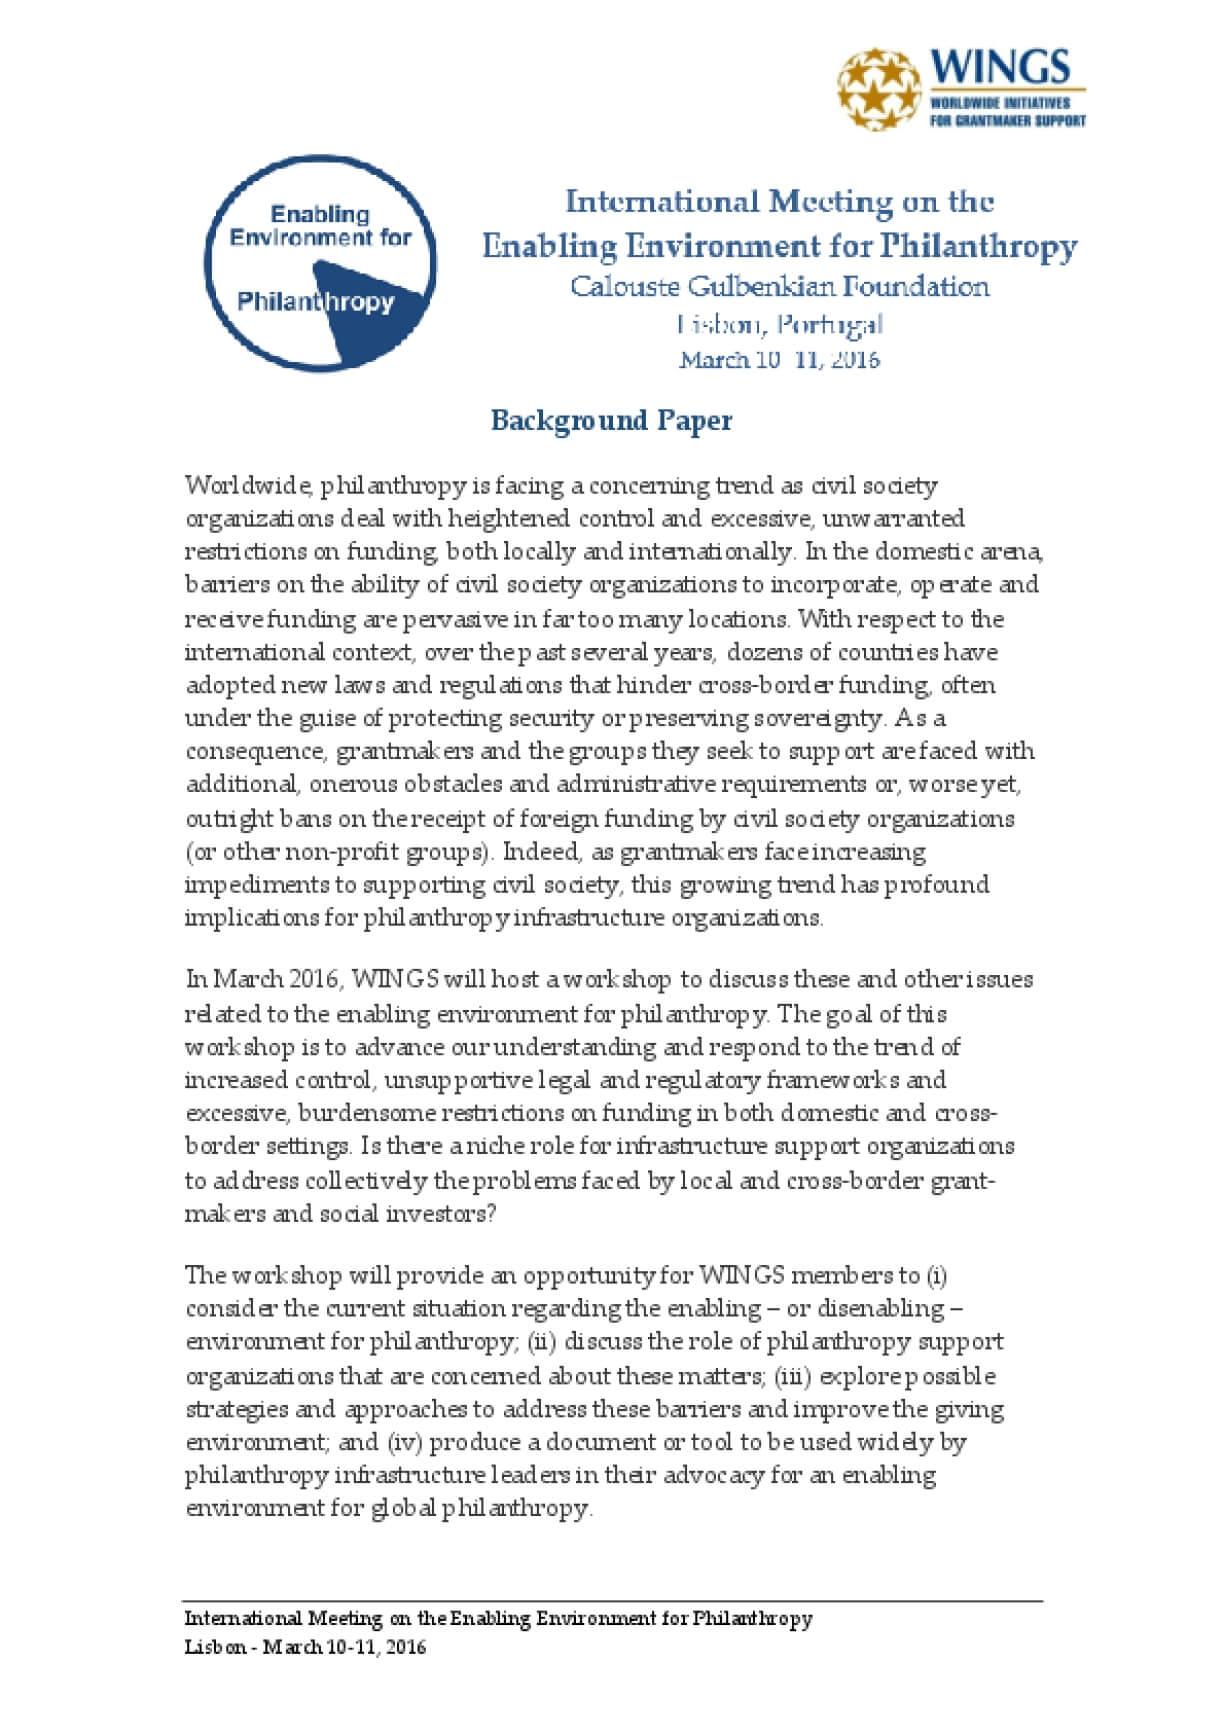 International Meeting on the Enabling Environment for Philanthropy